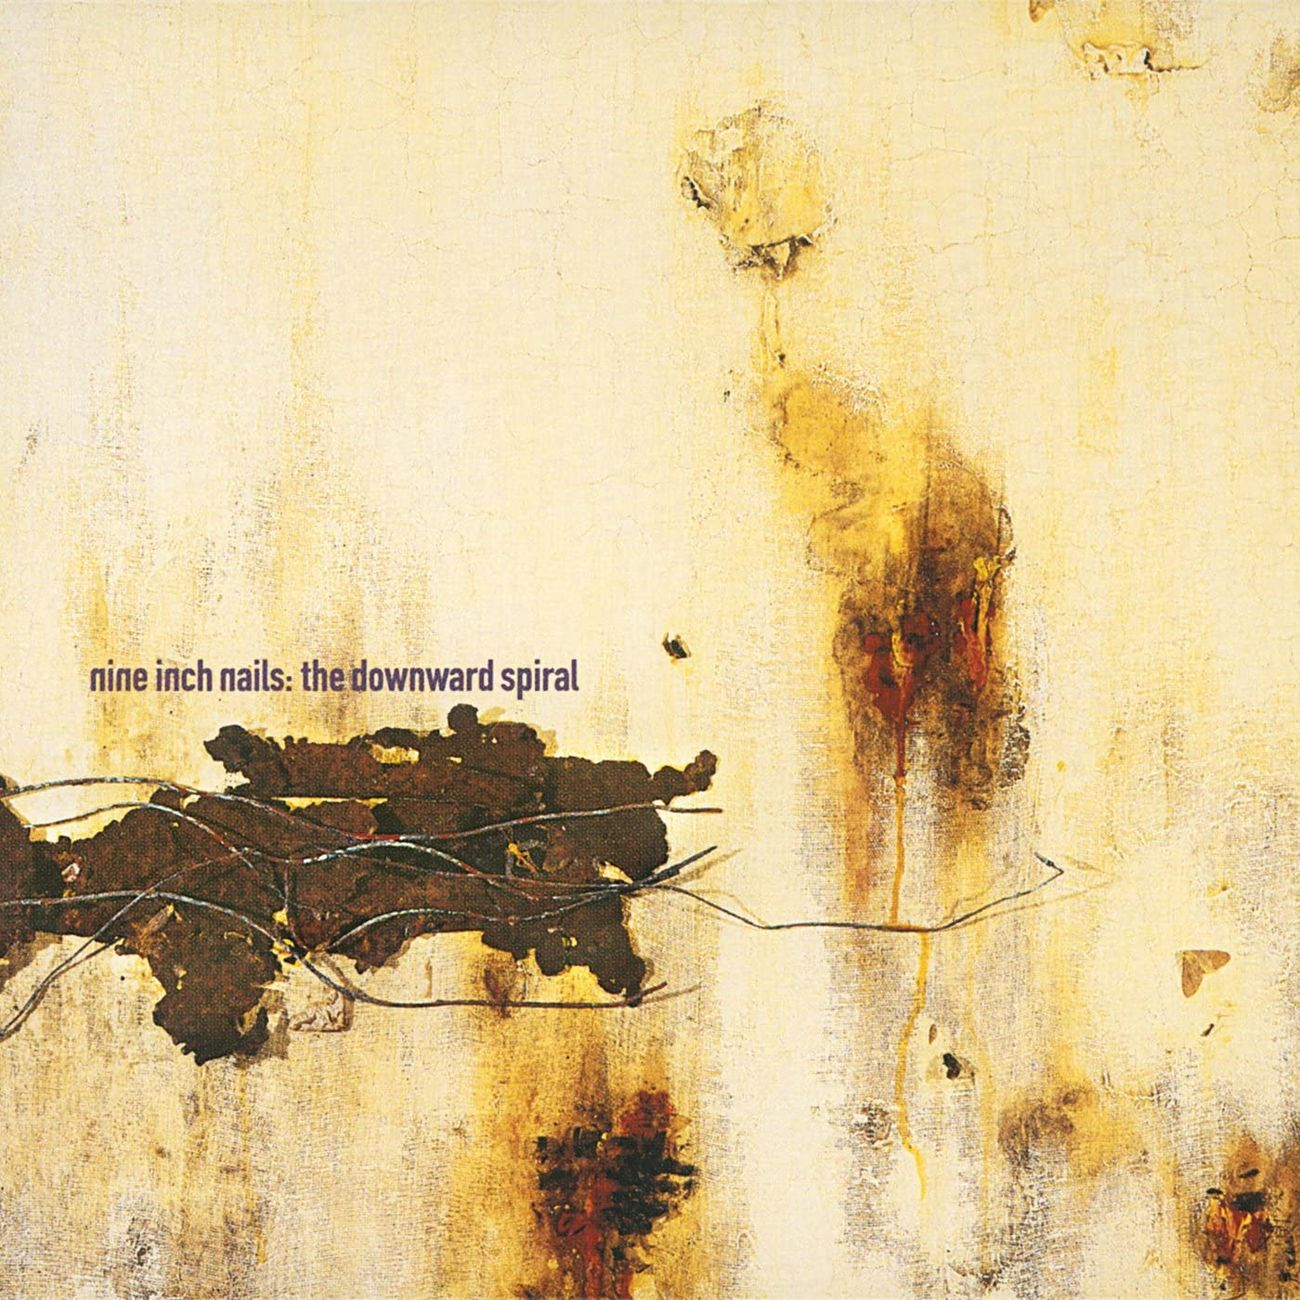 Nine Inch Nails, The Downward Spiral (1994), copertina dell'album